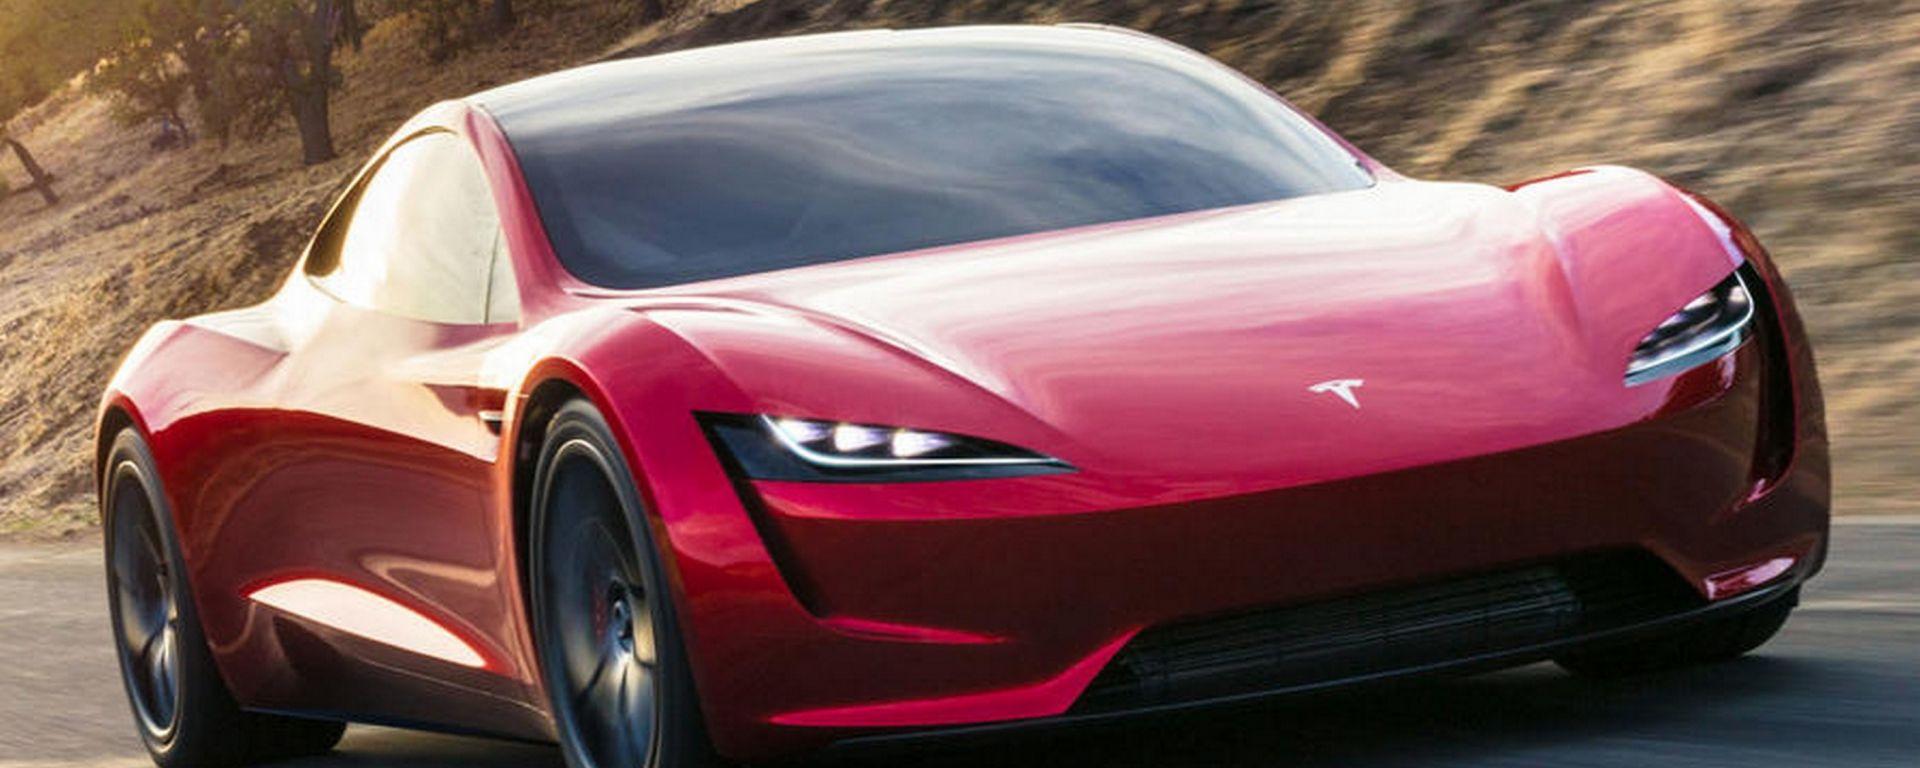 Tesla: pronta a svelare un nuovo modello a Basilea?